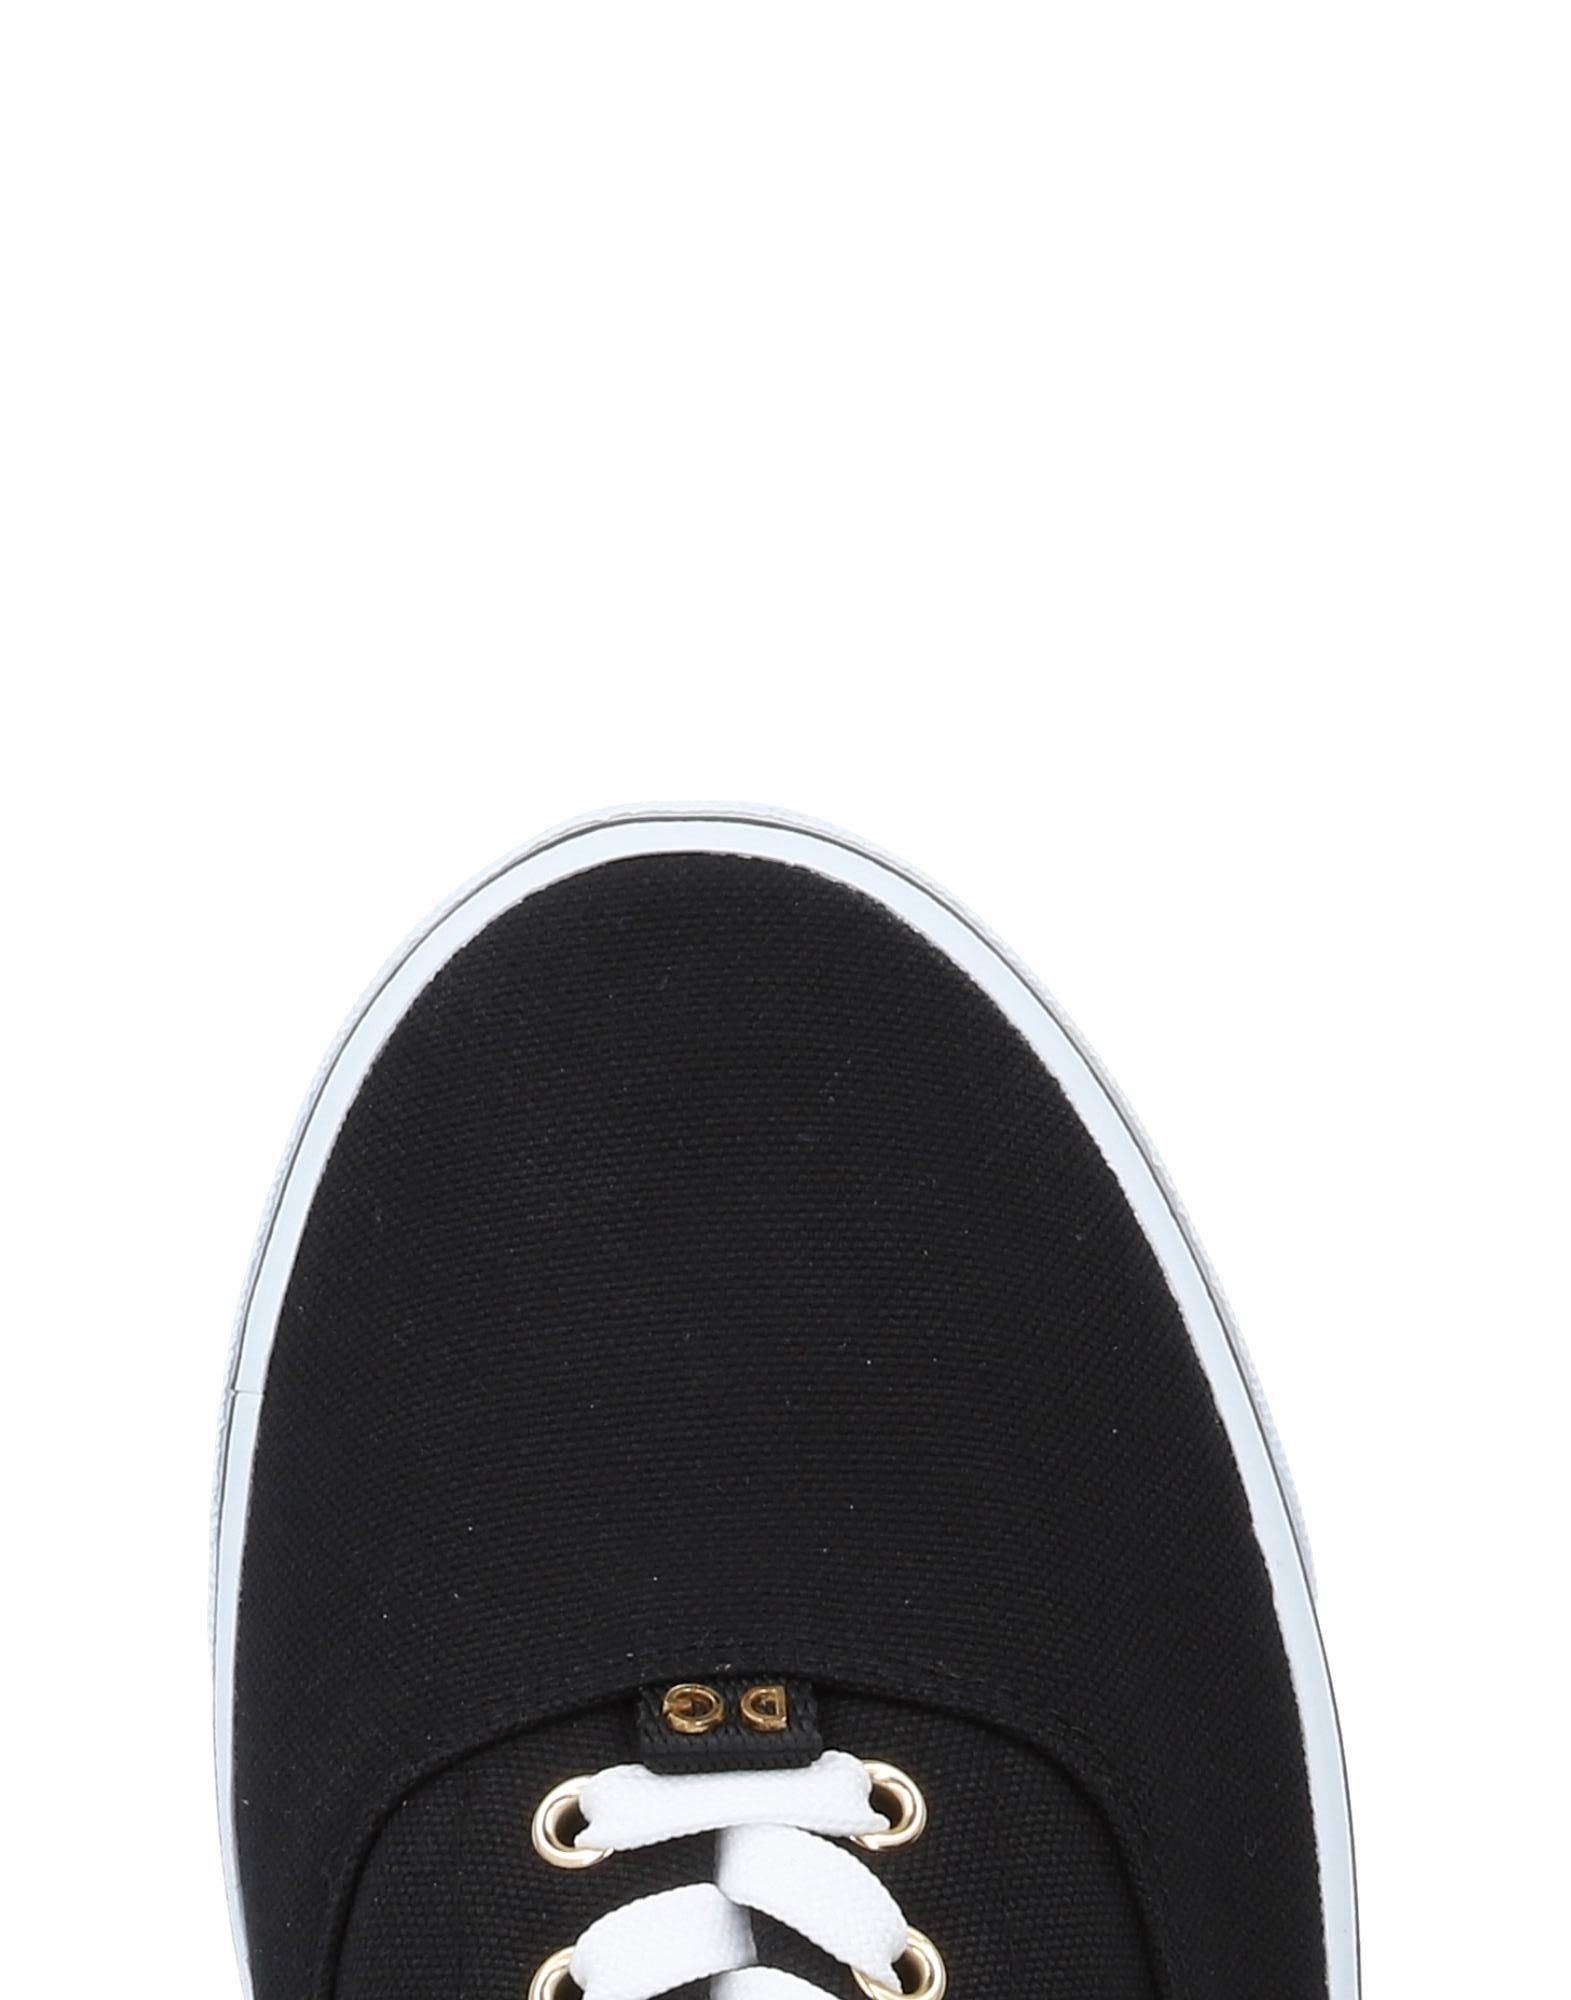 Dolce & Gabbana Qualität Sneakers Herren  11460969UW Gute Qualität Gabbana beliebte Schuhe 81c5d3